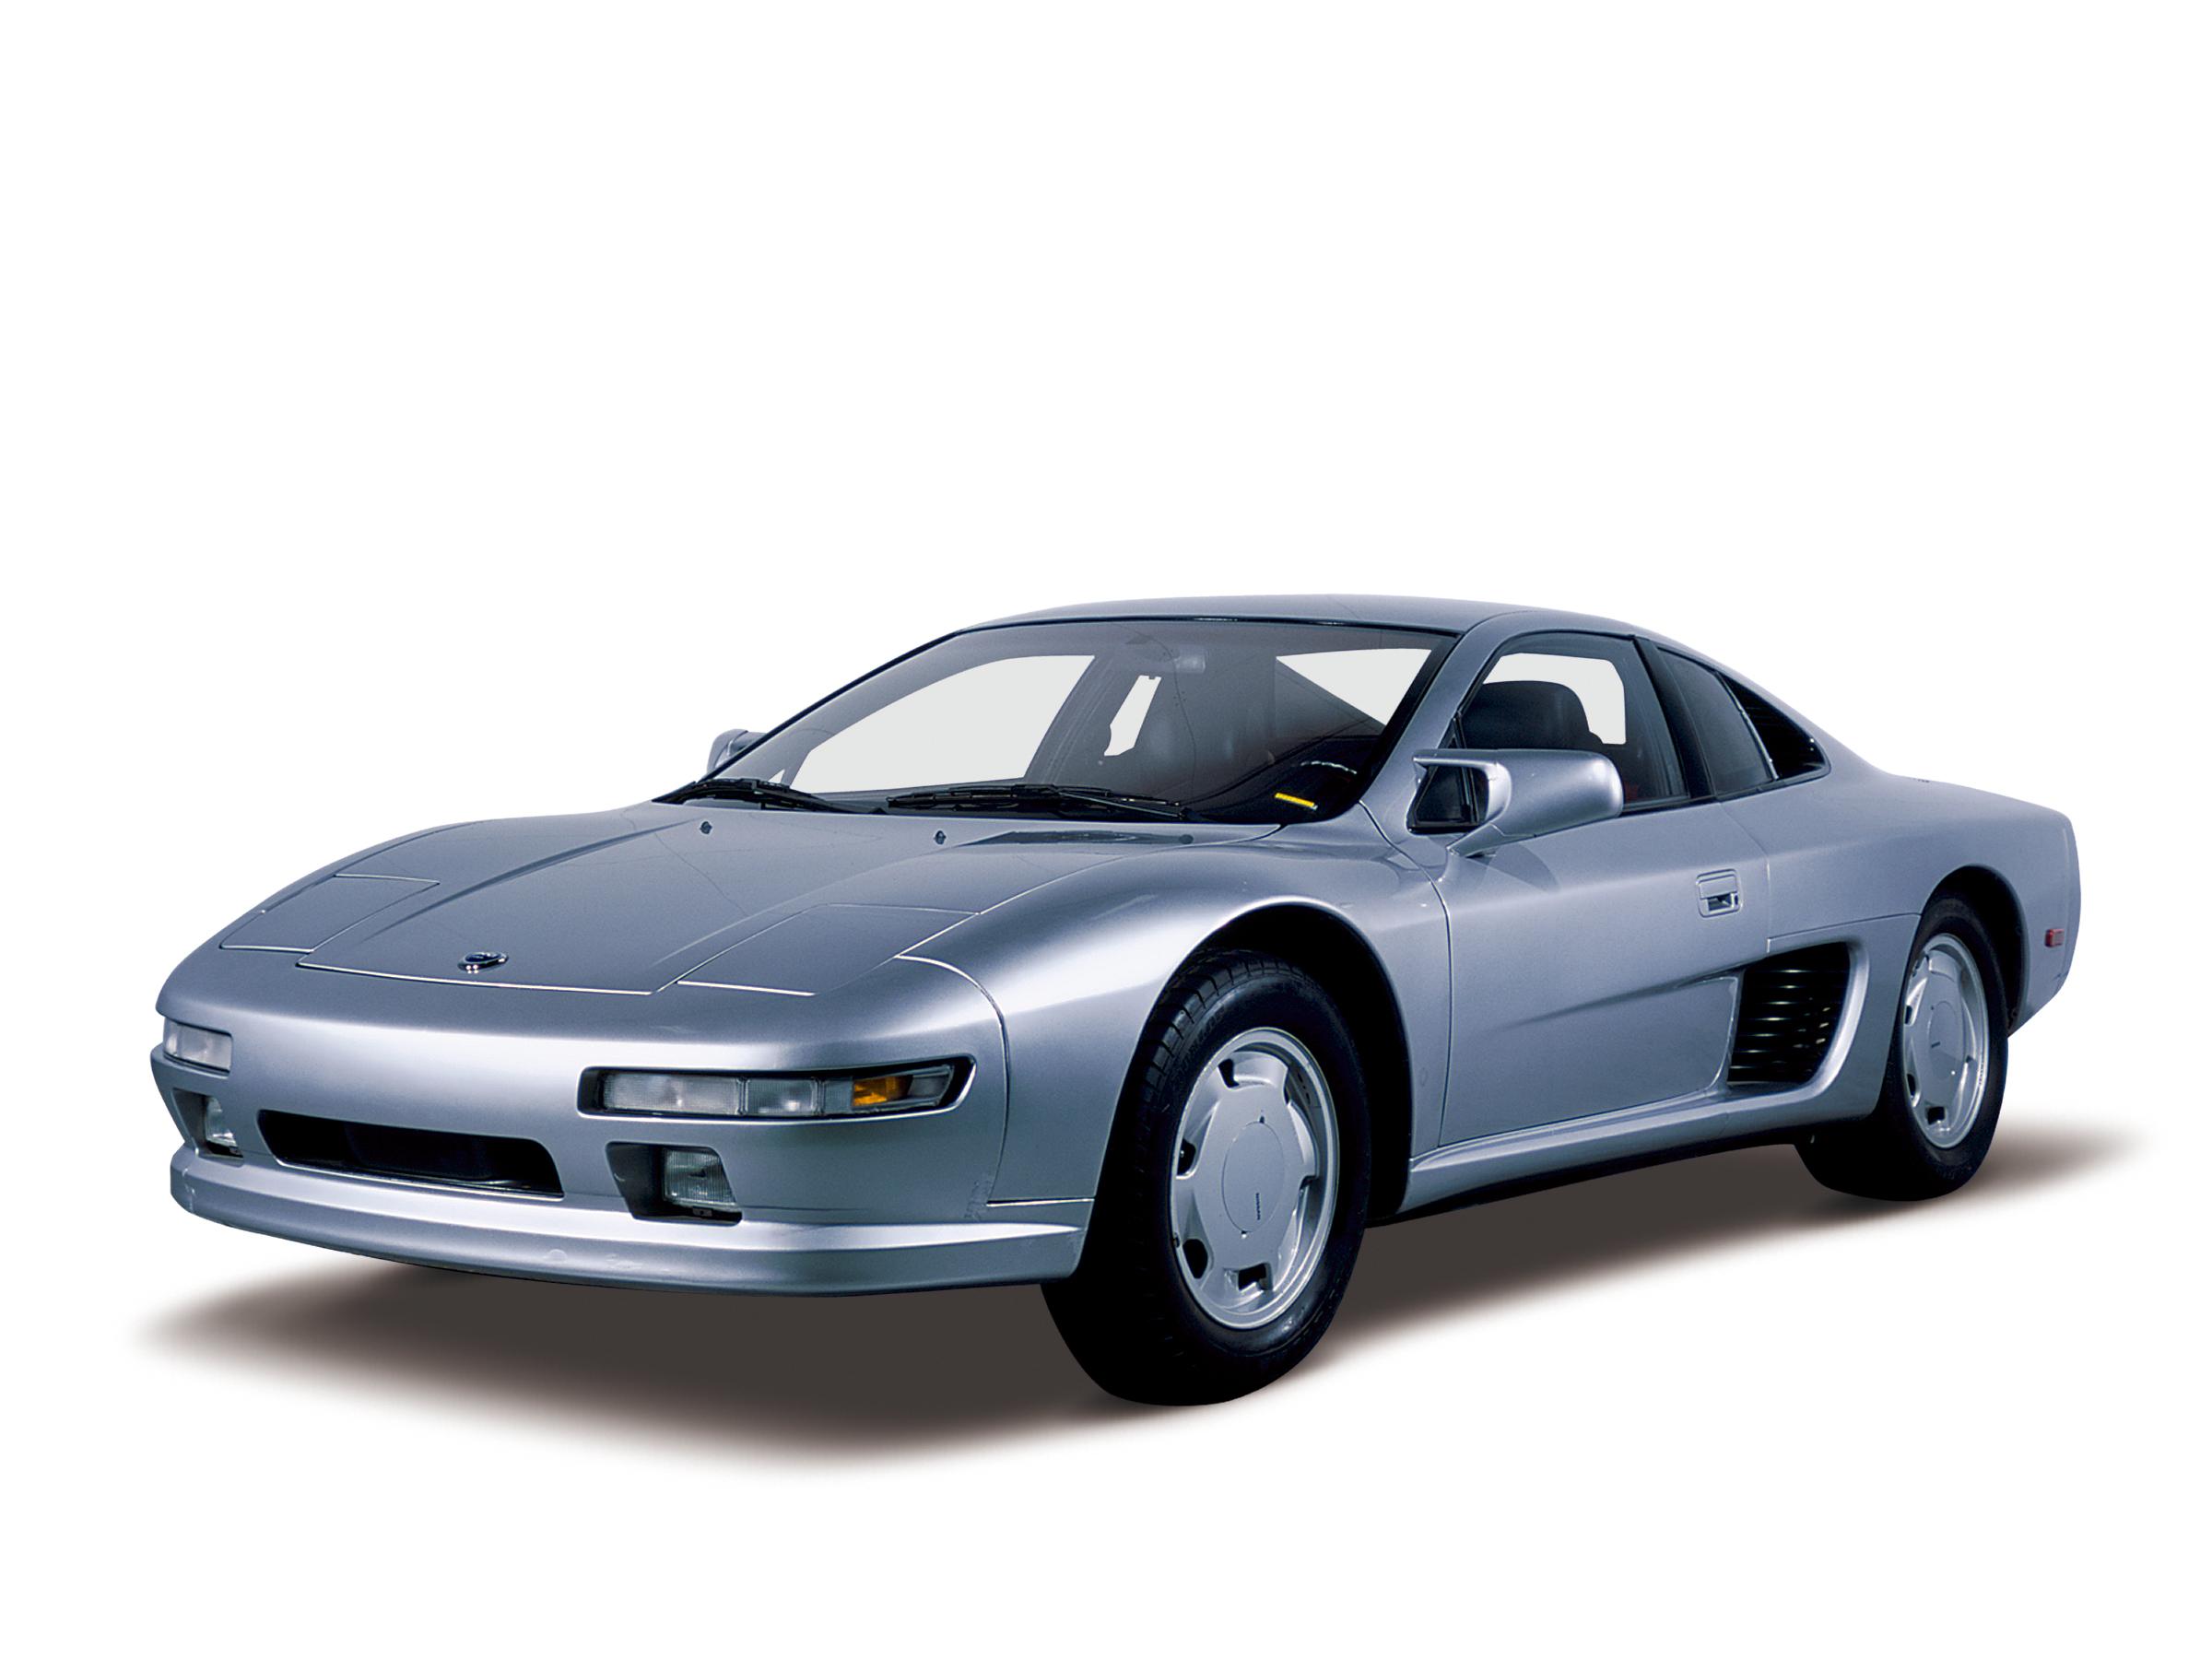 Nissan | Heritage Collection | Nissan MID 4 (Type II)